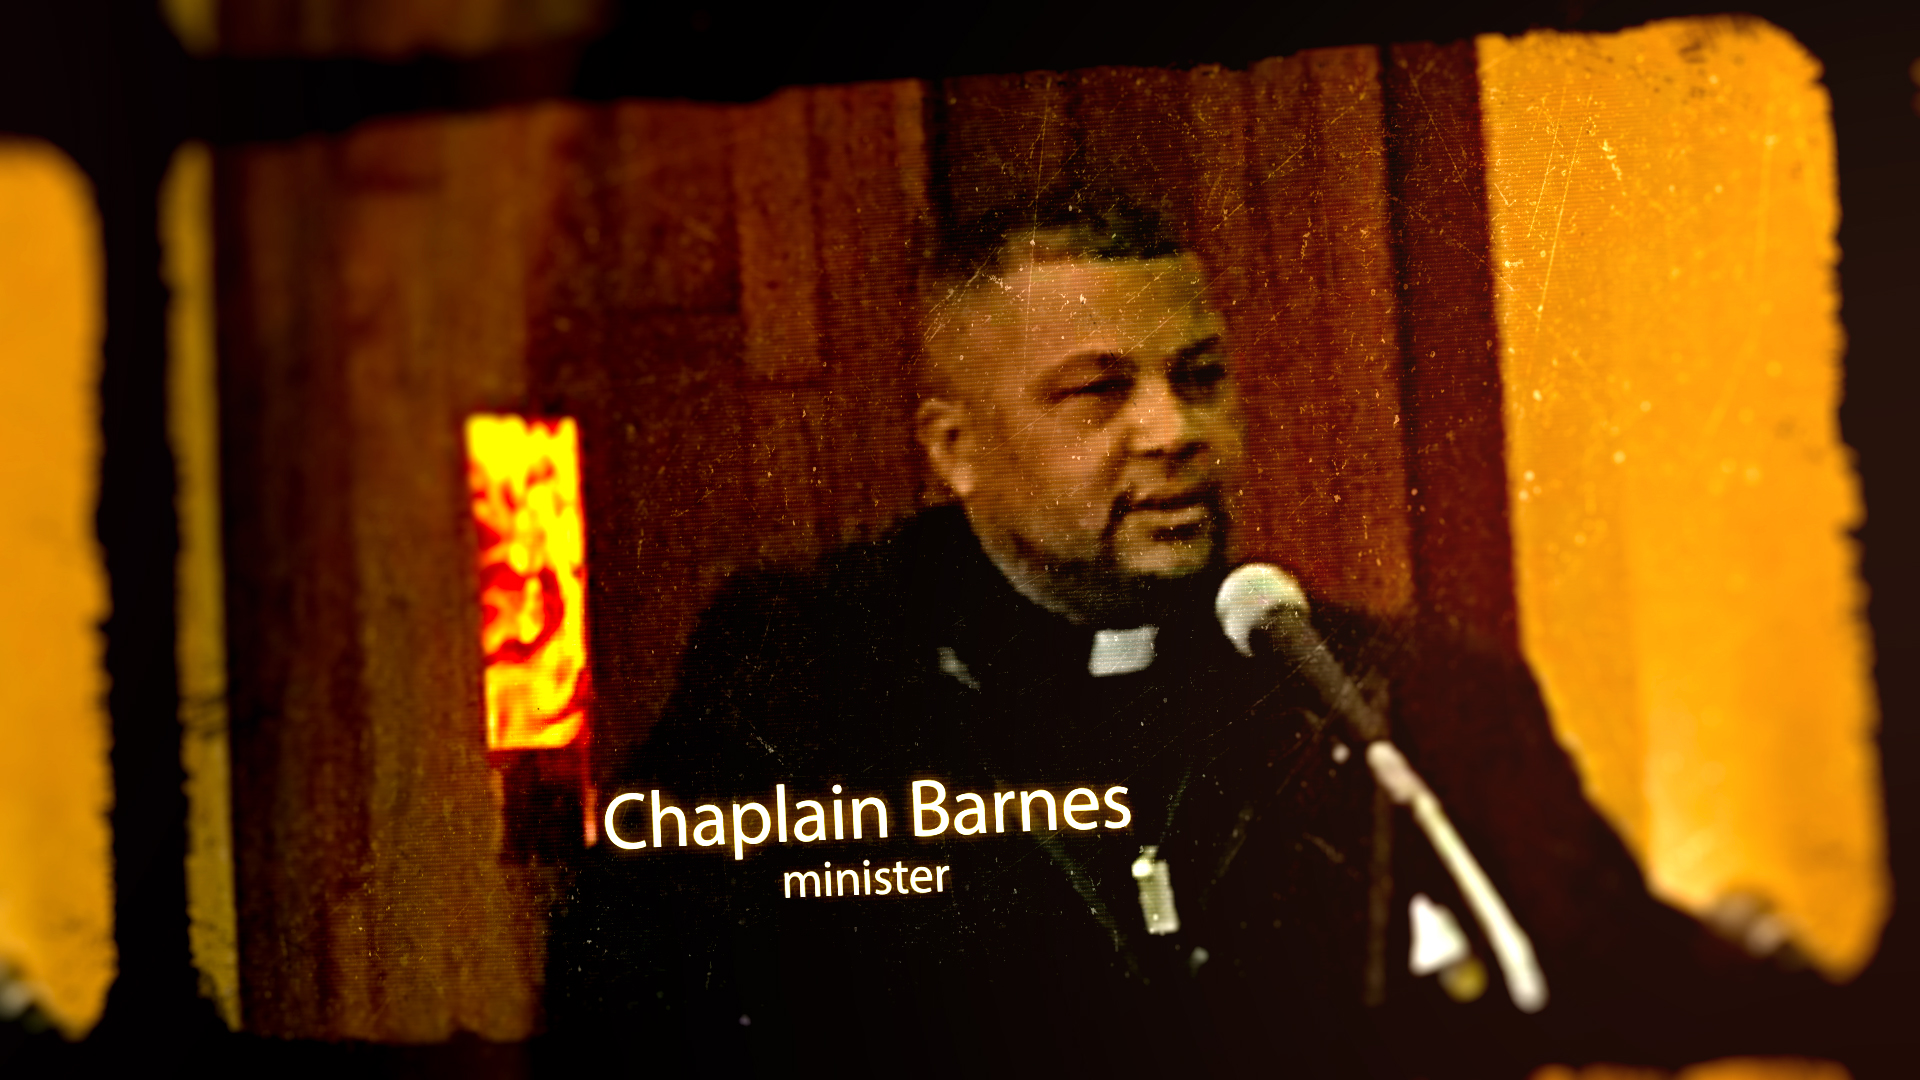 God's Grace International Builds an Online Church with Head Chaplain Barnes